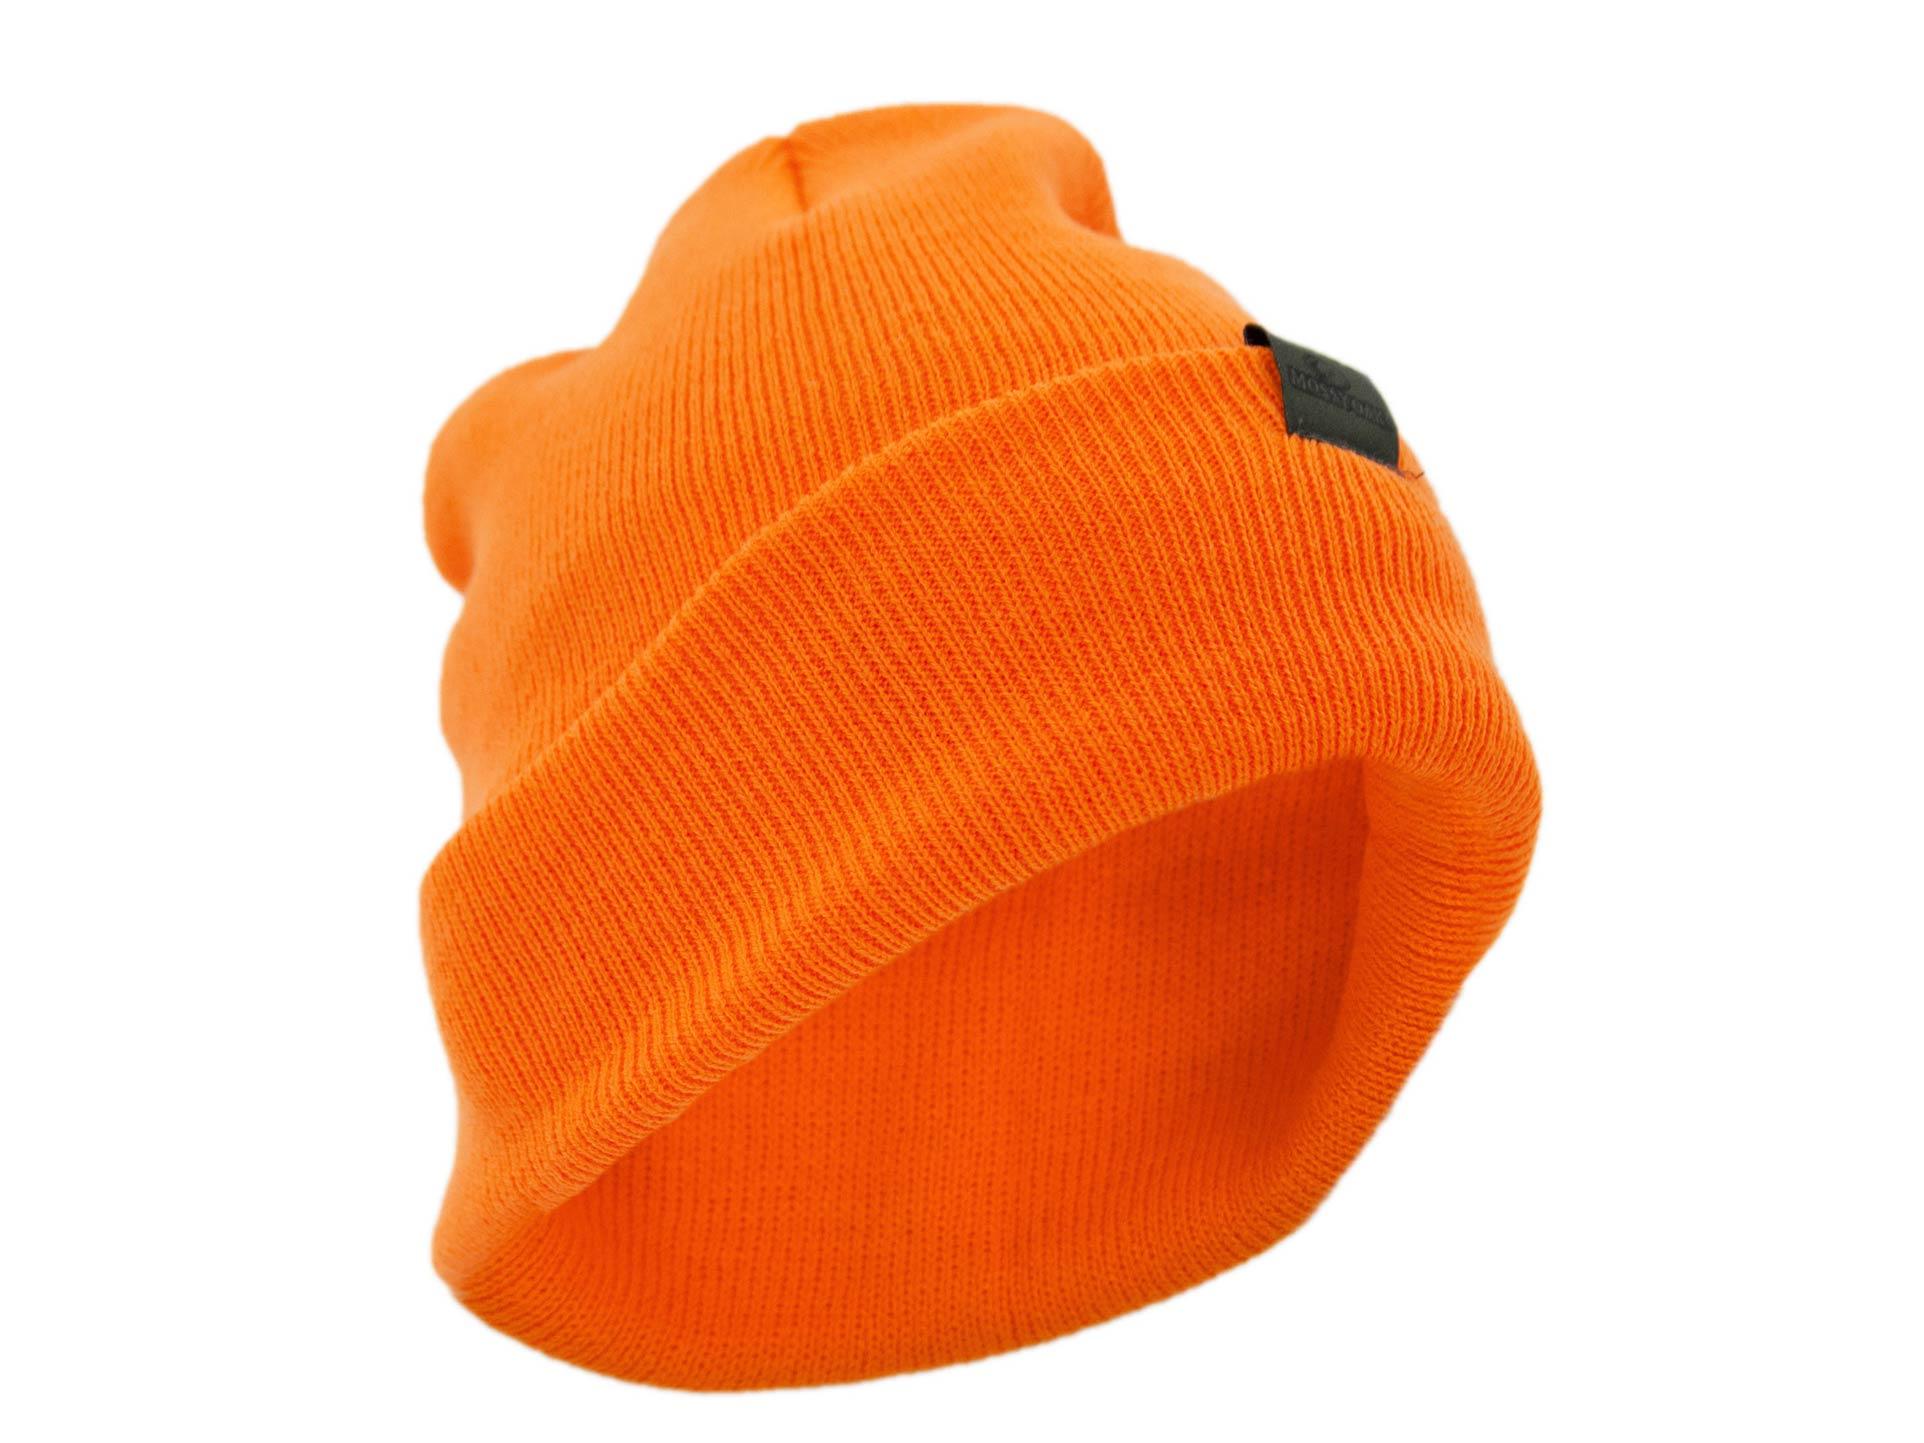 Blaze Orange Insulated Hat